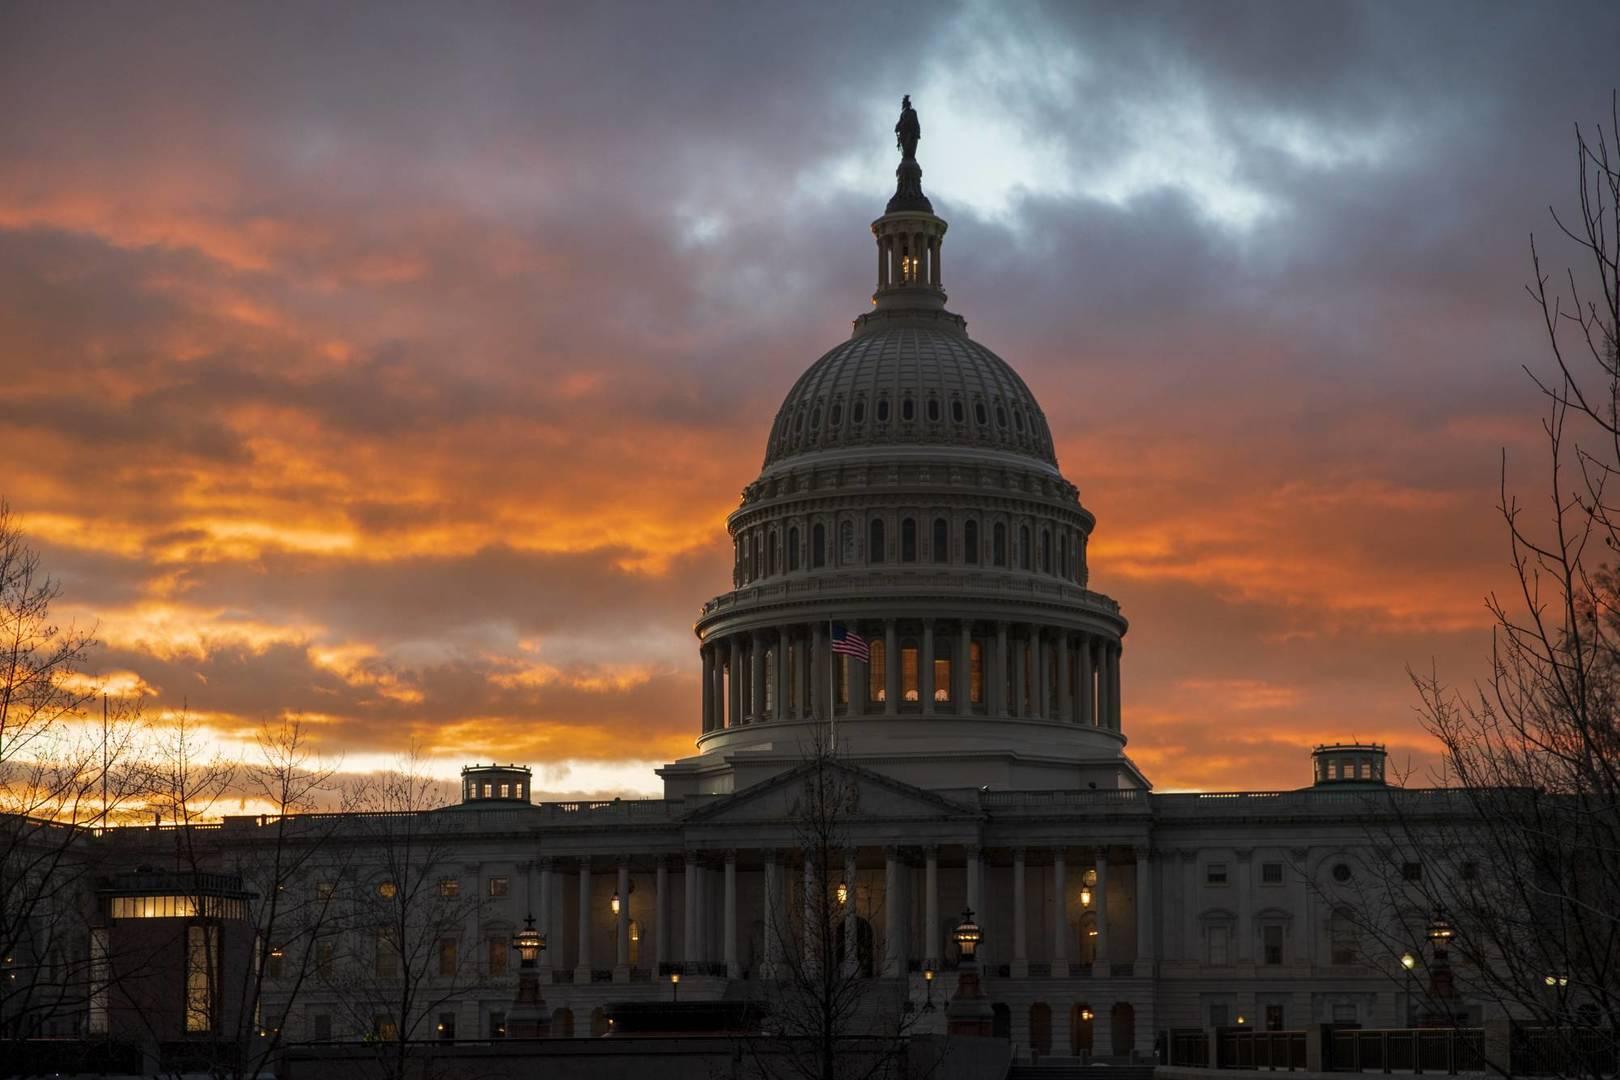 Senate, Congress, House of Representatives